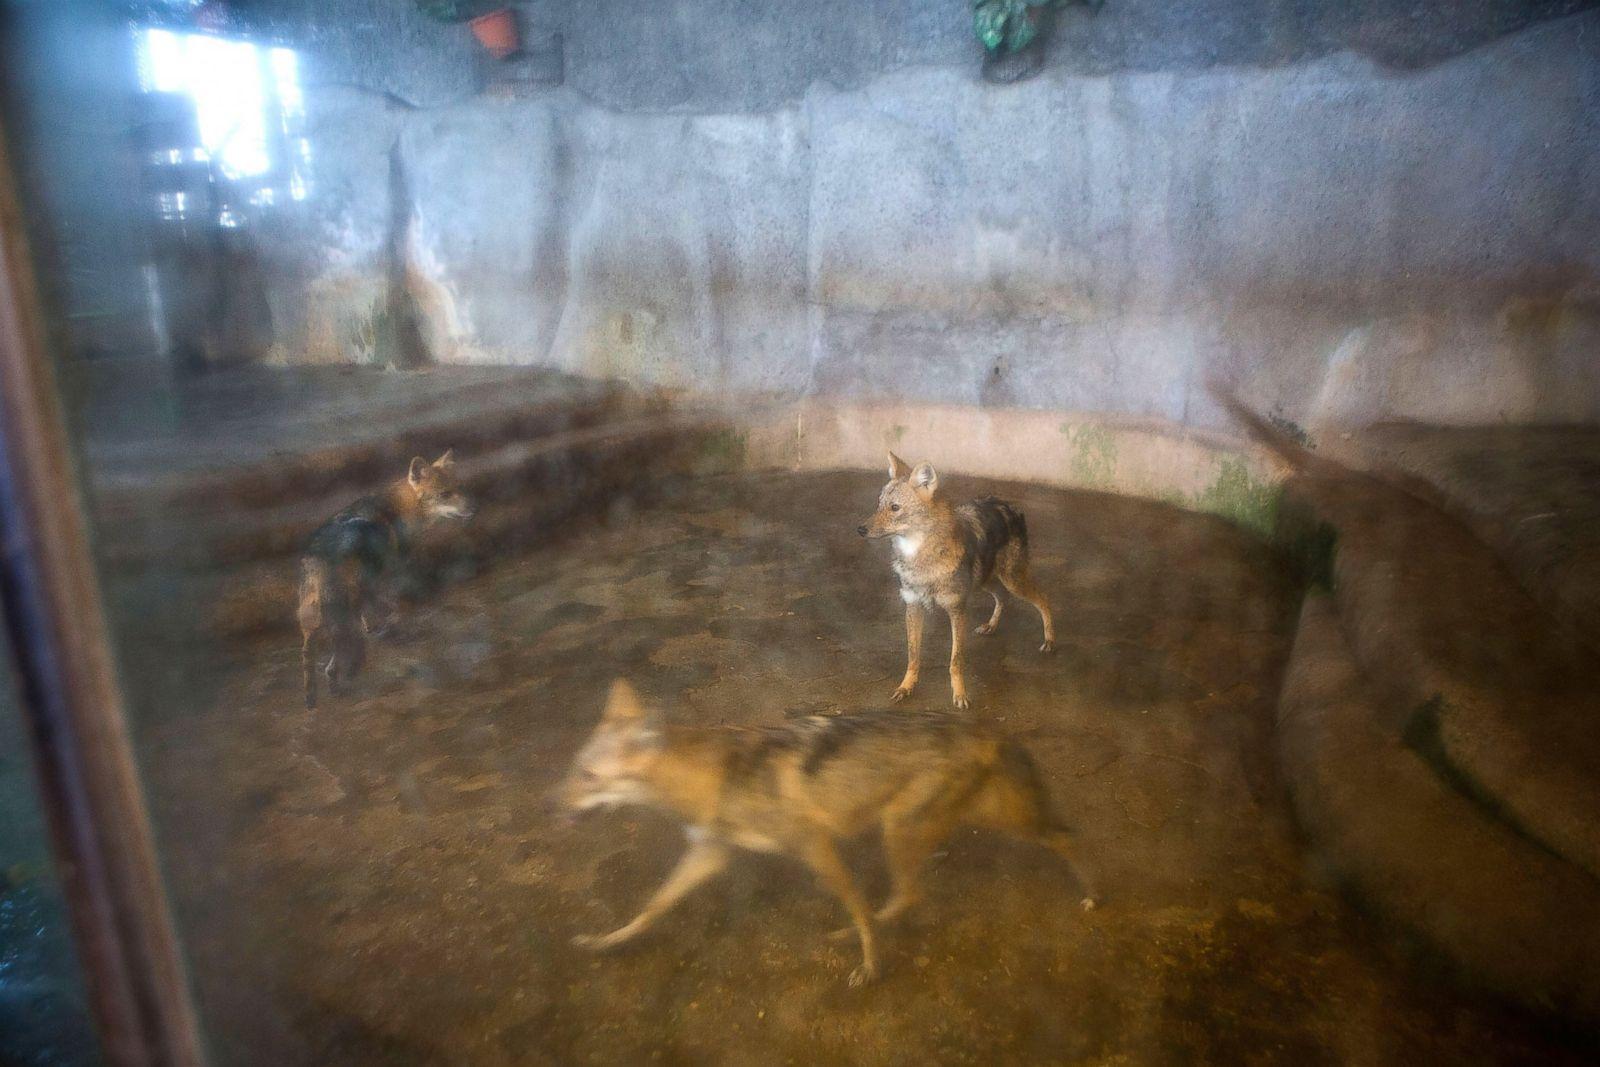 Decrepit Department Store Zoo Draws Protests Photos  Image #9 - ABC News